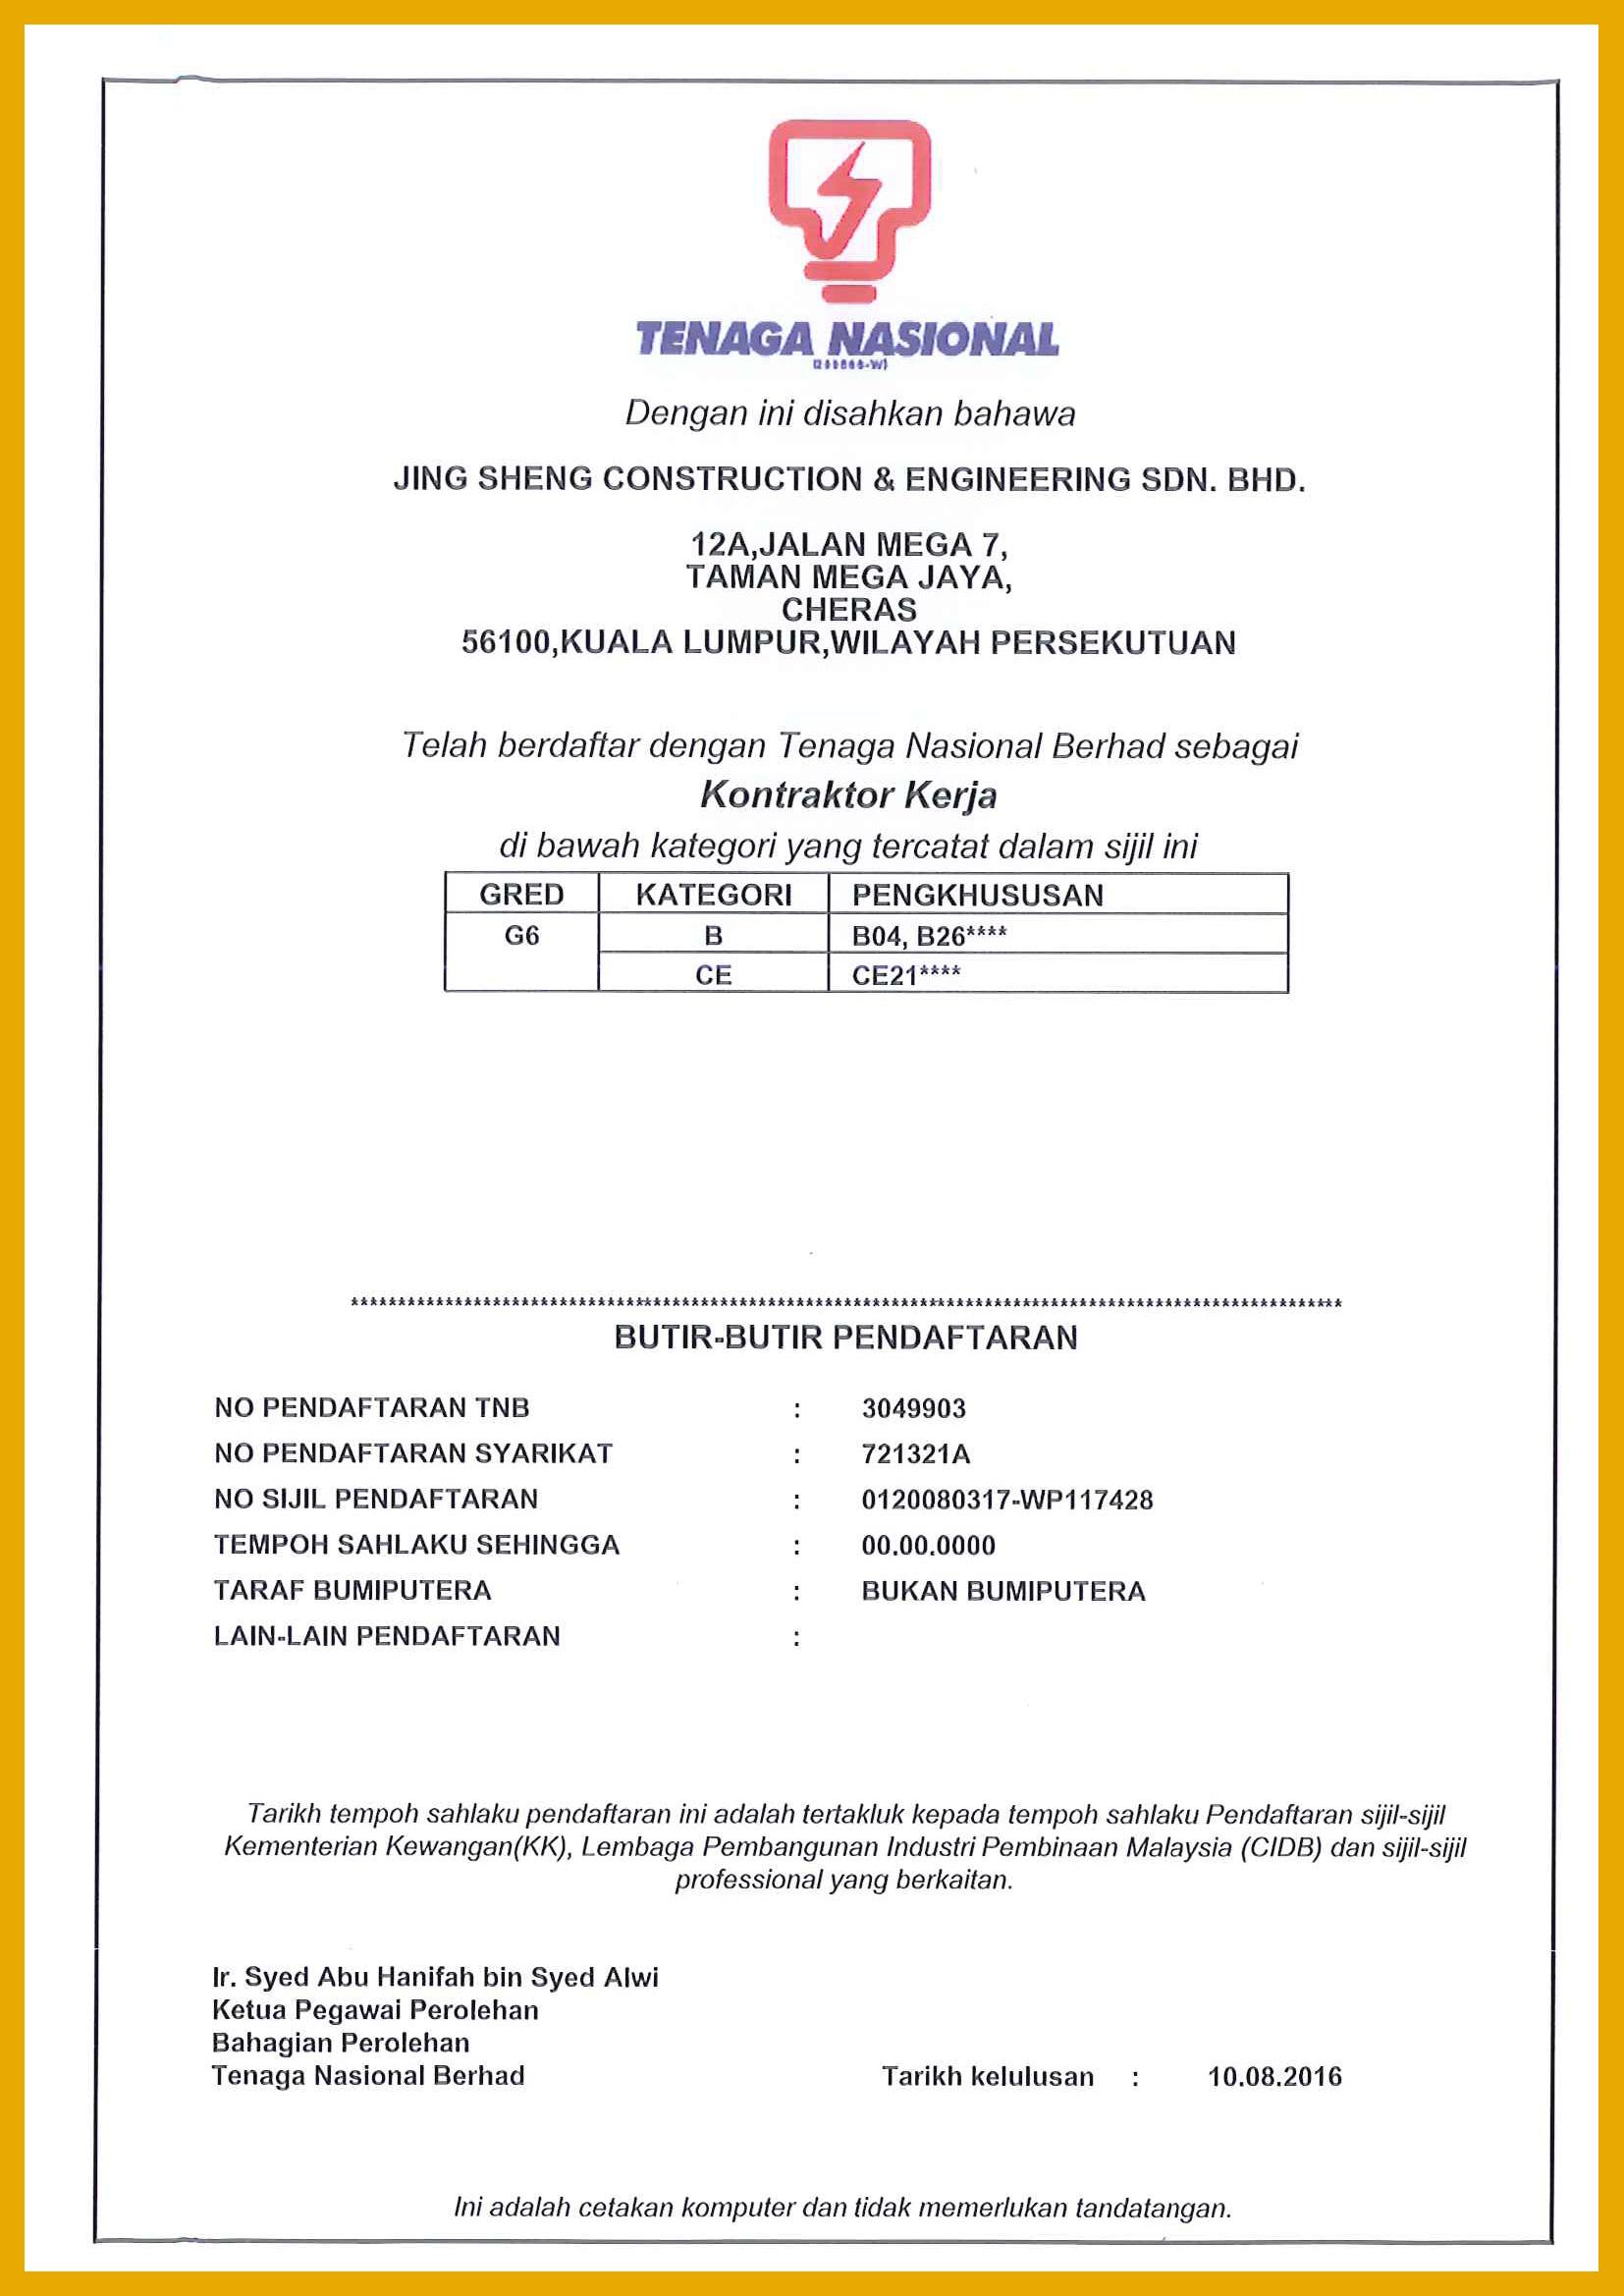 sijil-pengesahan-tnb